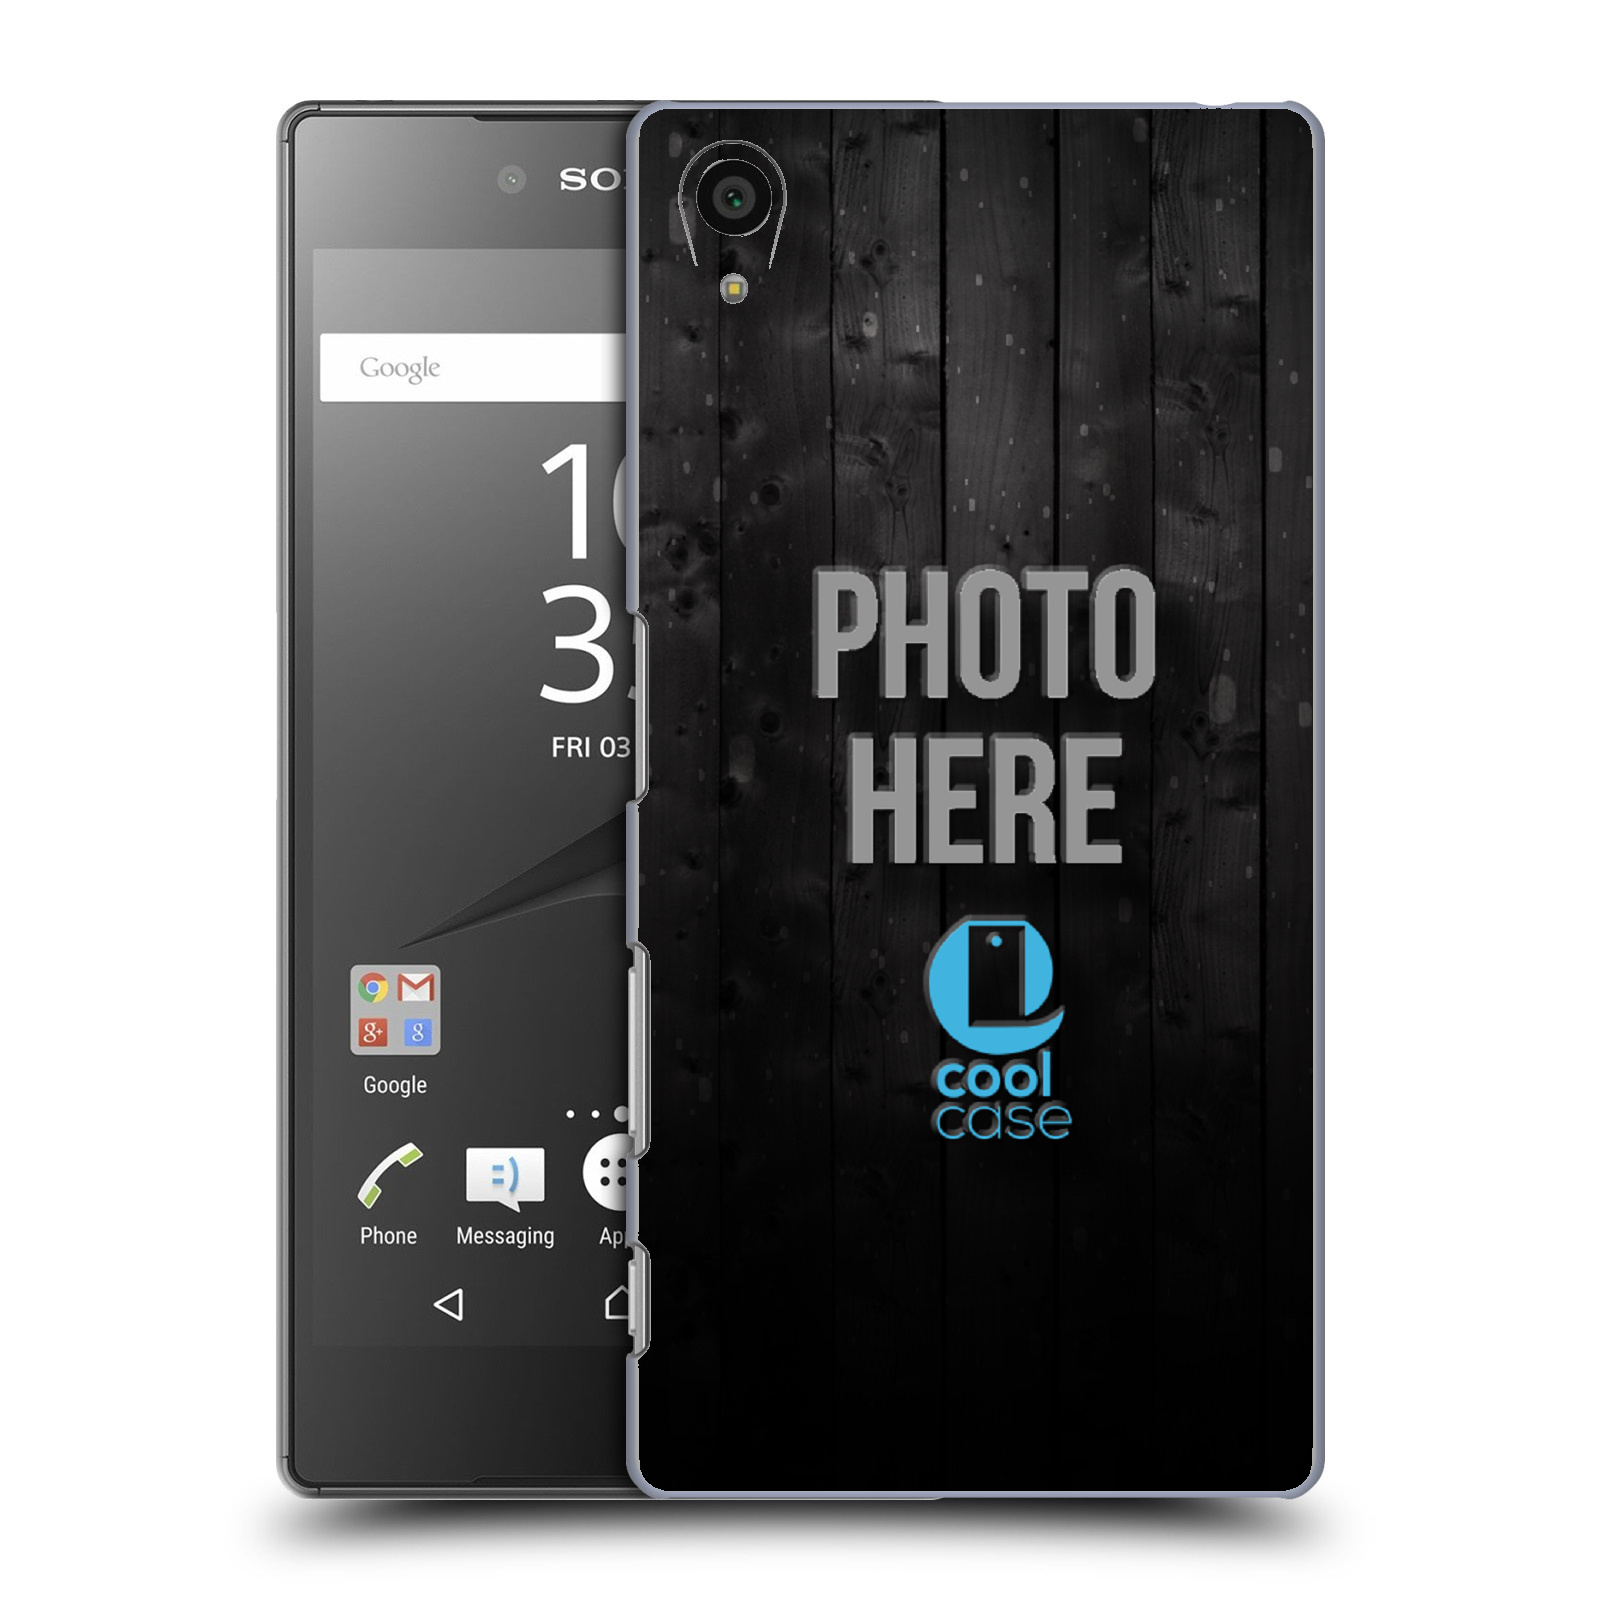 Plastové pouzdro na mobil Sony Xperia Z5 Premium s vlastním motivem (Plastový kryt či obal s vlastní fotografií na mobilní telefon Sony Xperia Z5 Premium)